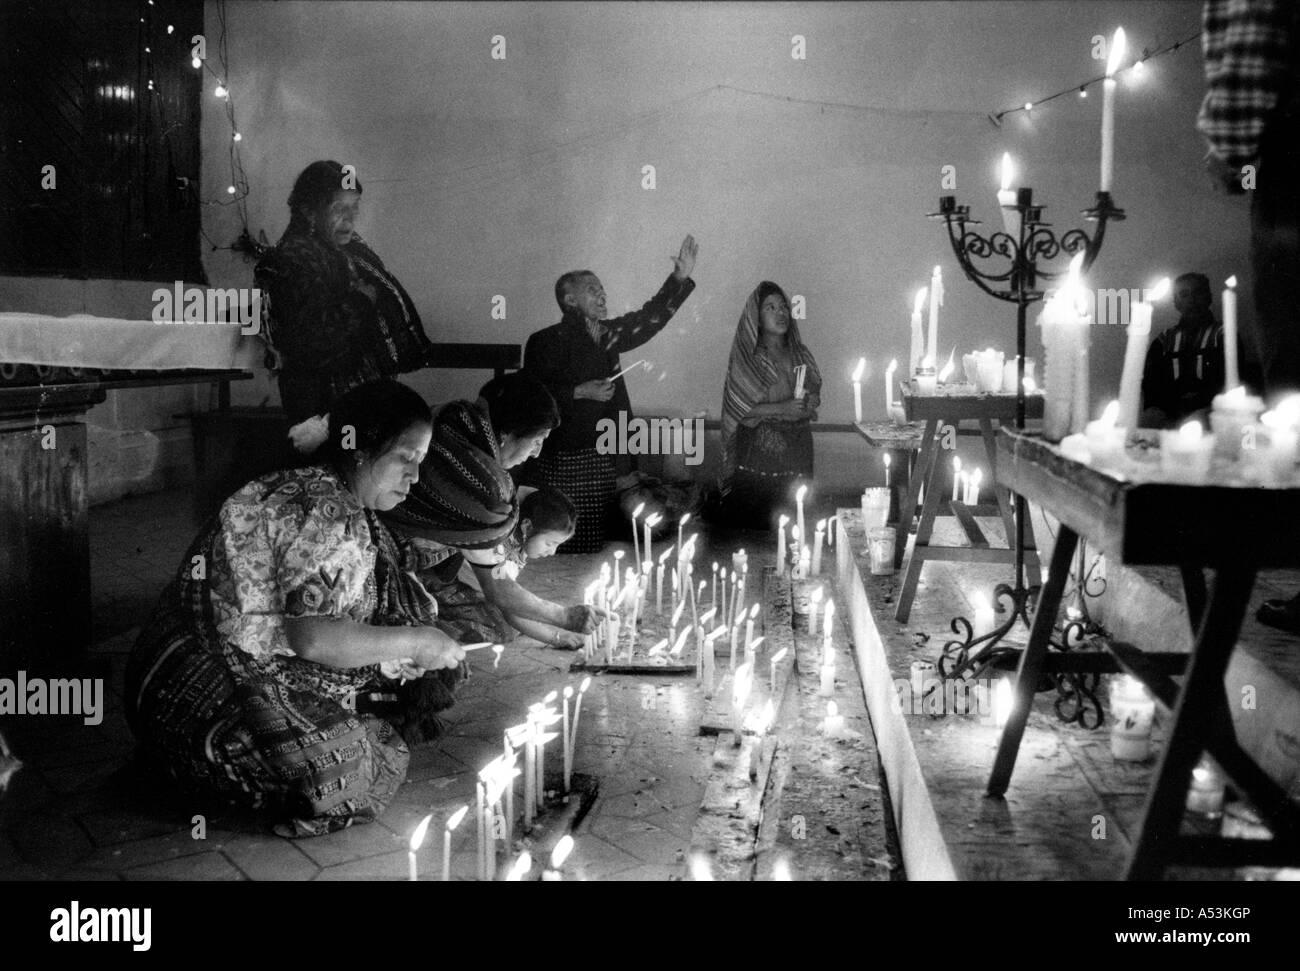 painet ha1276 063 black and white religion lighting candles alter cotholic church santa lucia utatlan guatemala alter lighting